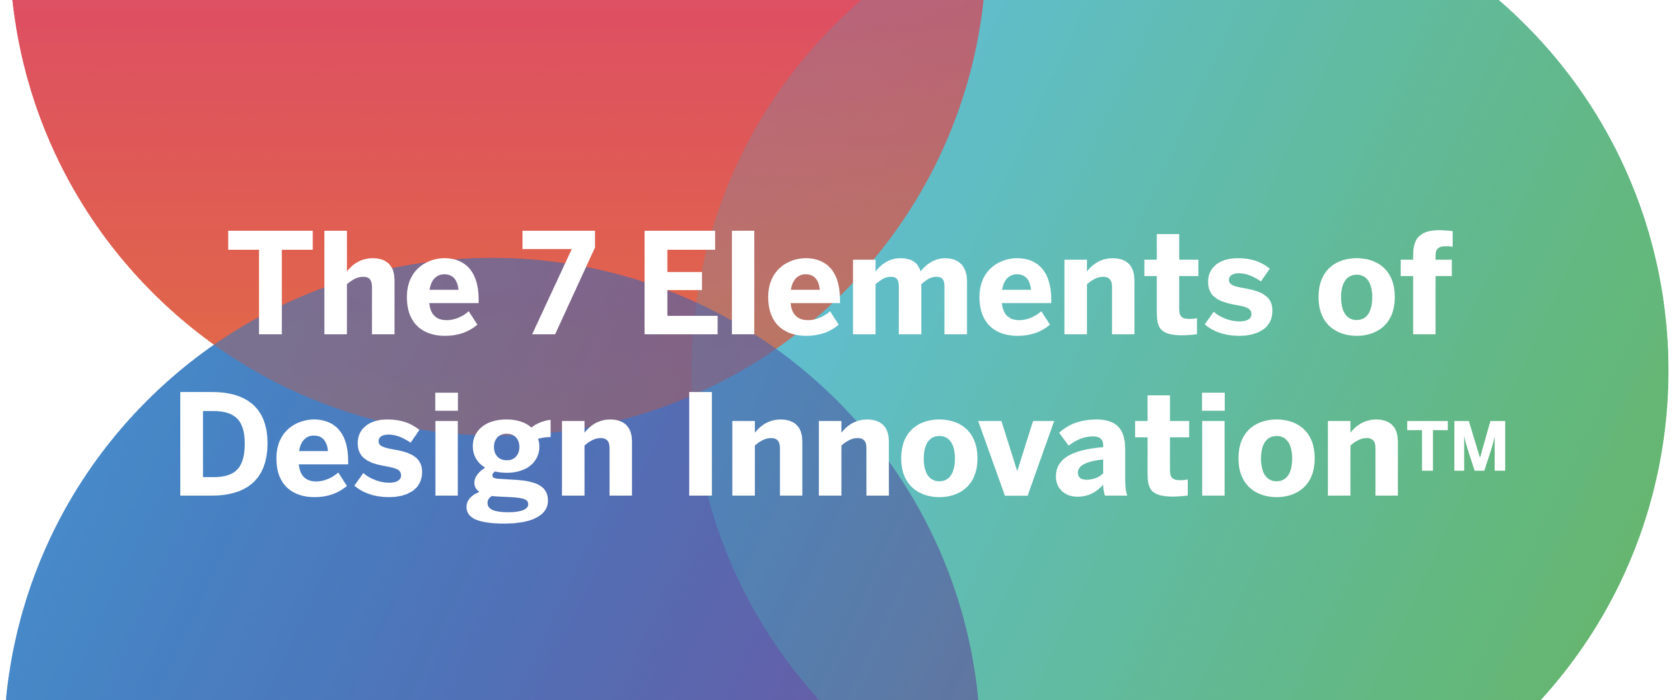 7 Elements of Design Innovation